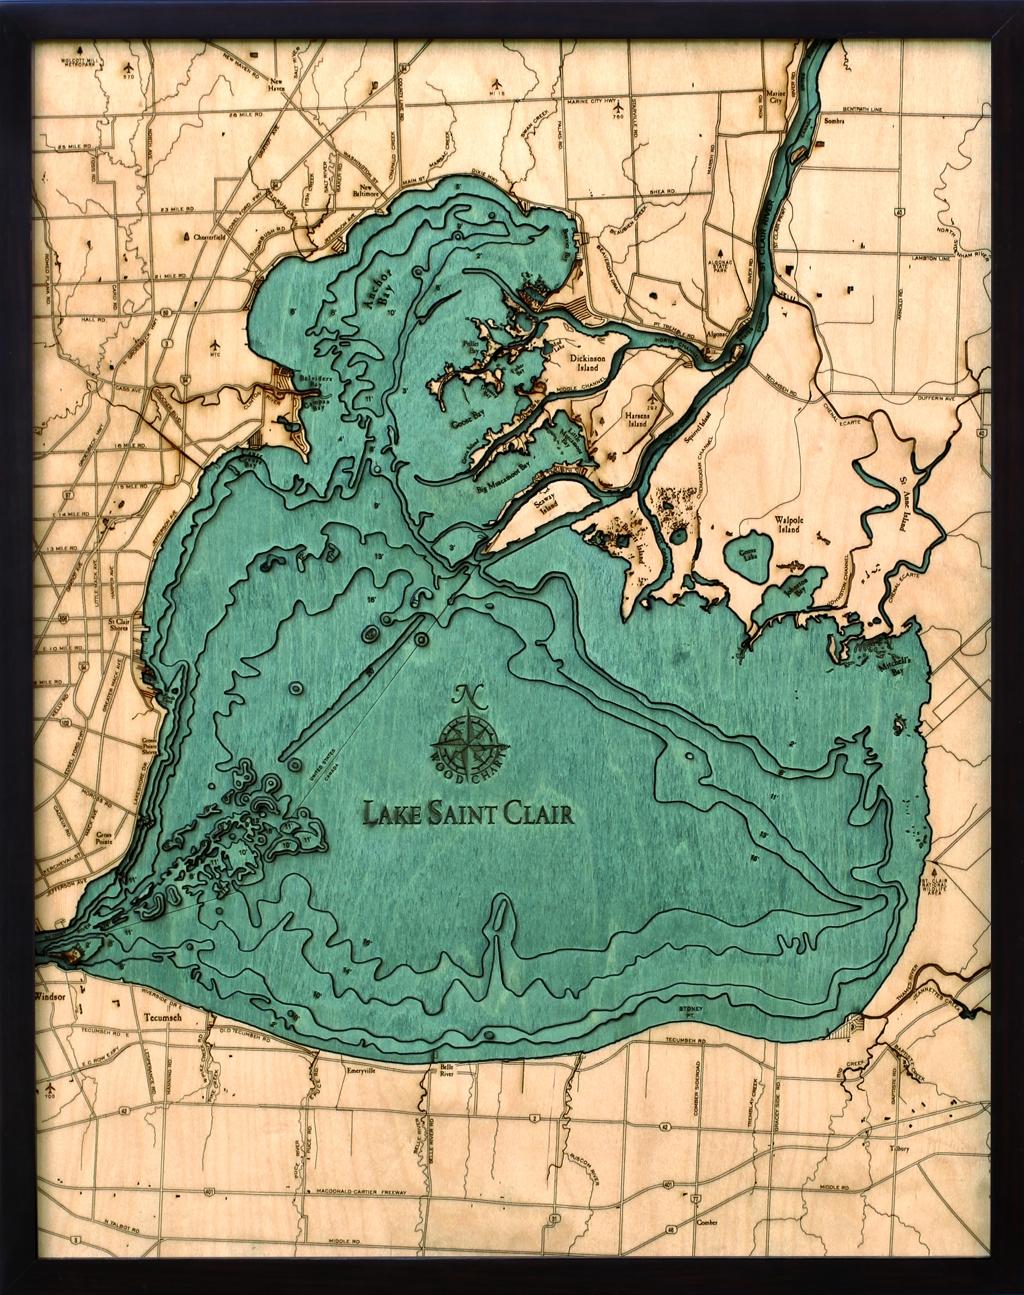 Lake St Clair Depth Chart Lake St Clair Depth Map - Lake erie topographic map